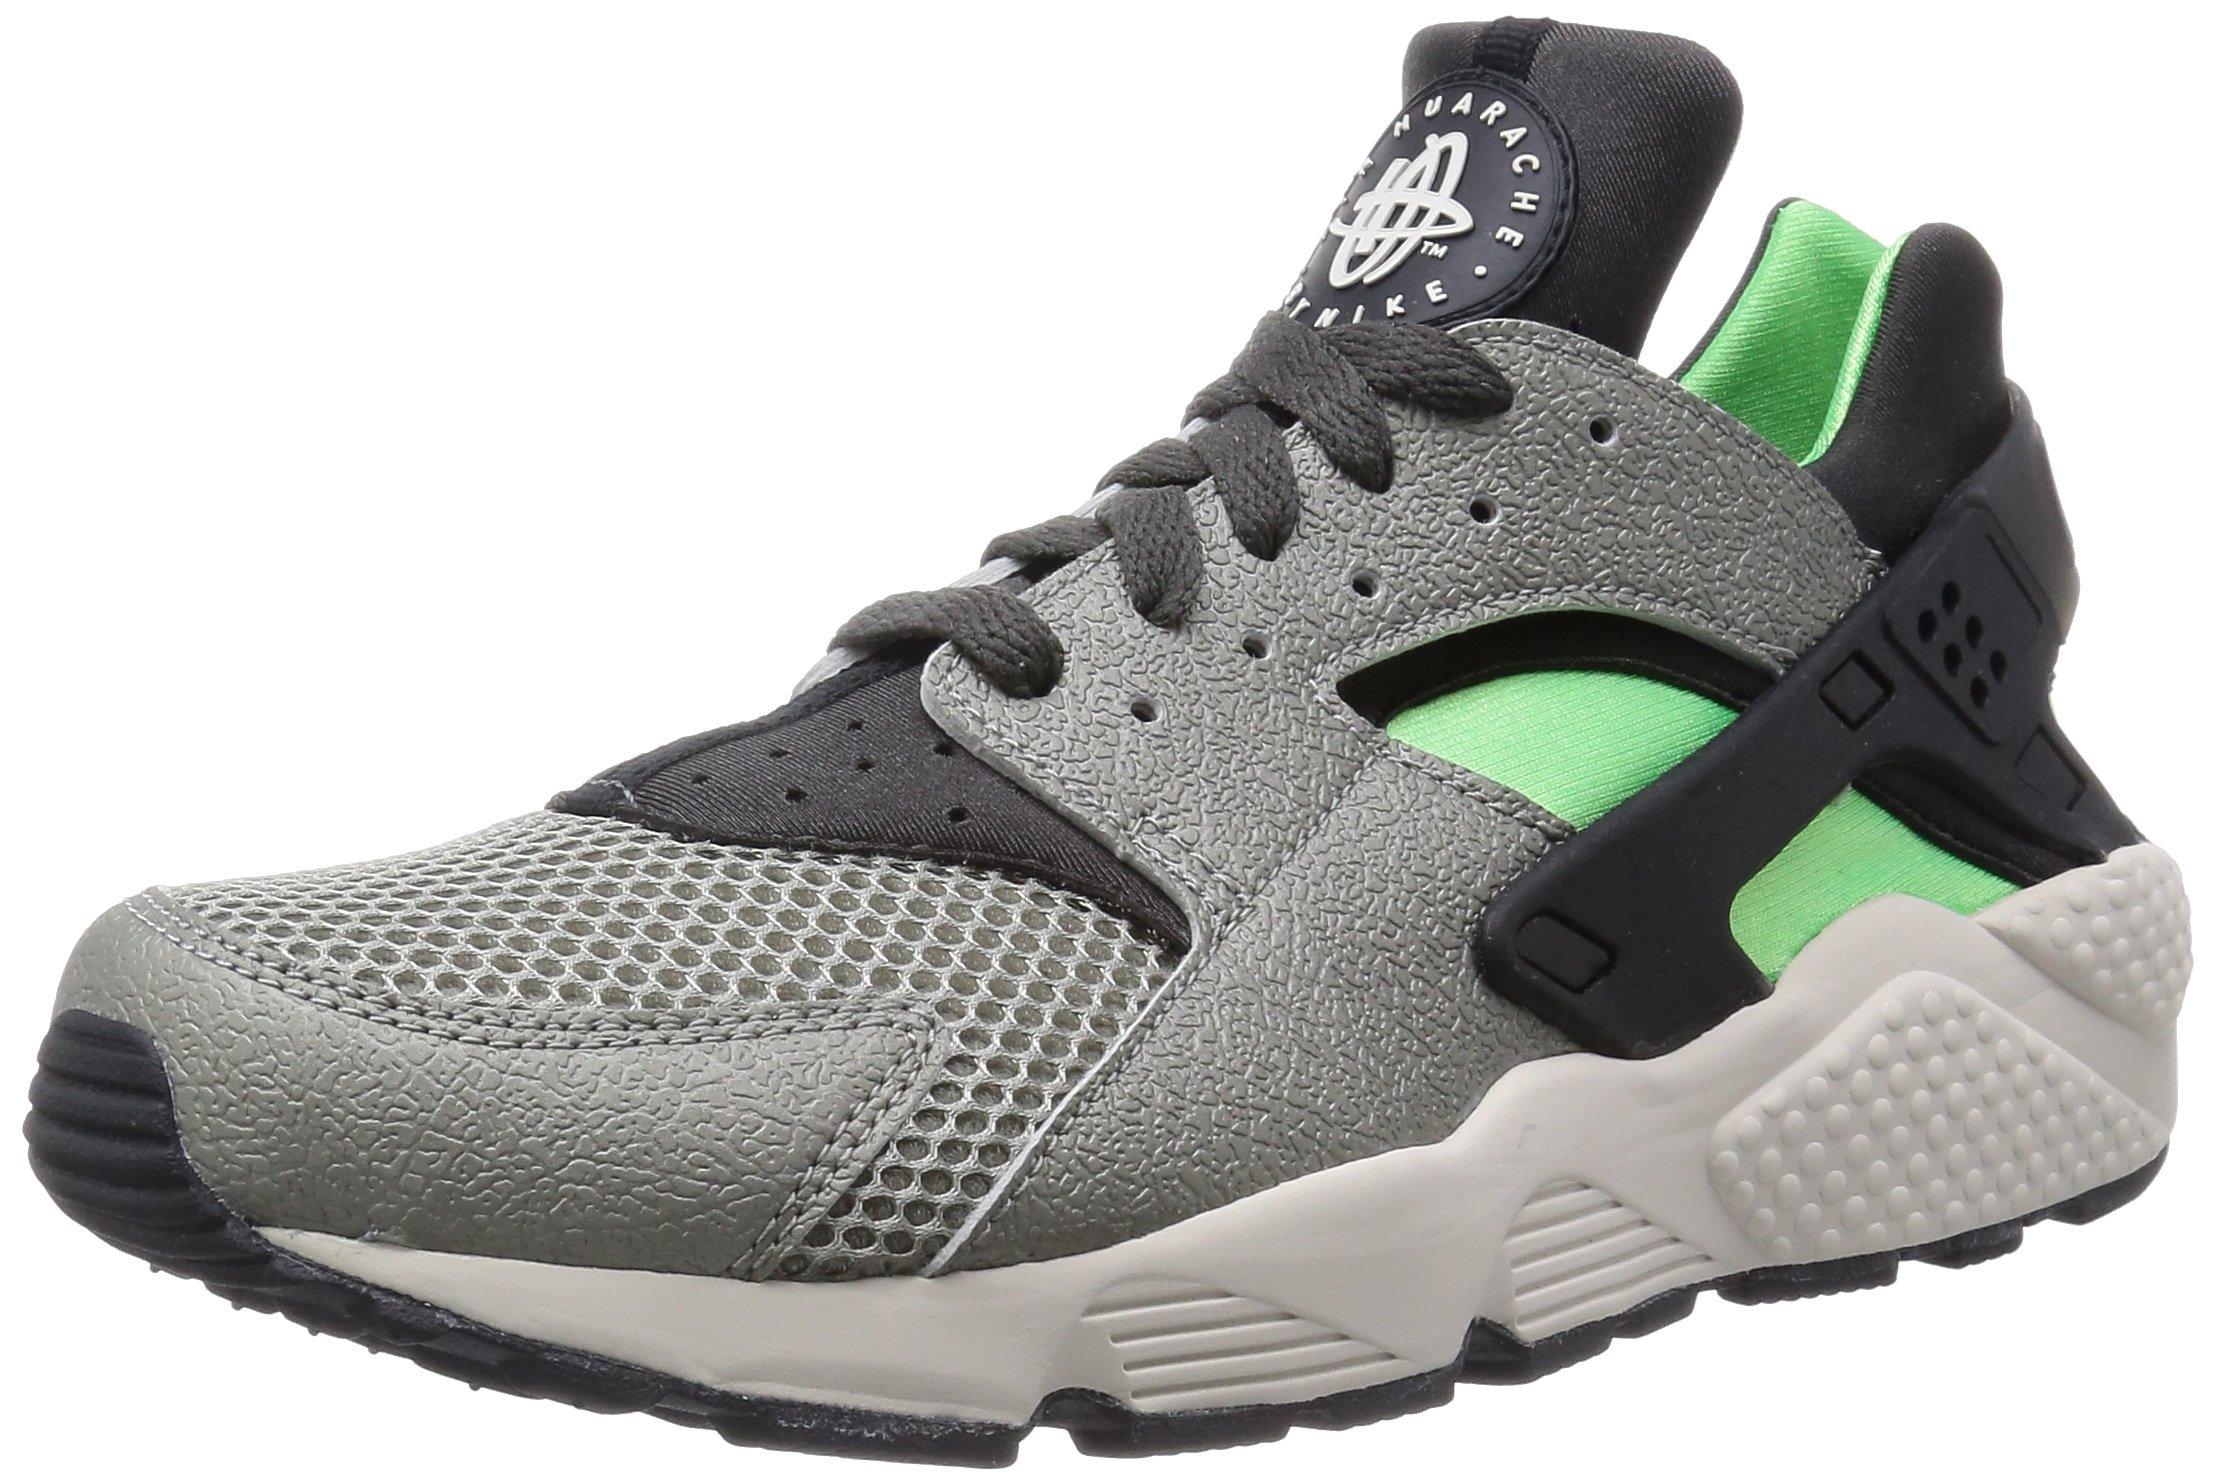 quality design e0805 eca5c Galleon - Nike Air Huarache (Poison Green) Light Bone Poison Green-Black (8)